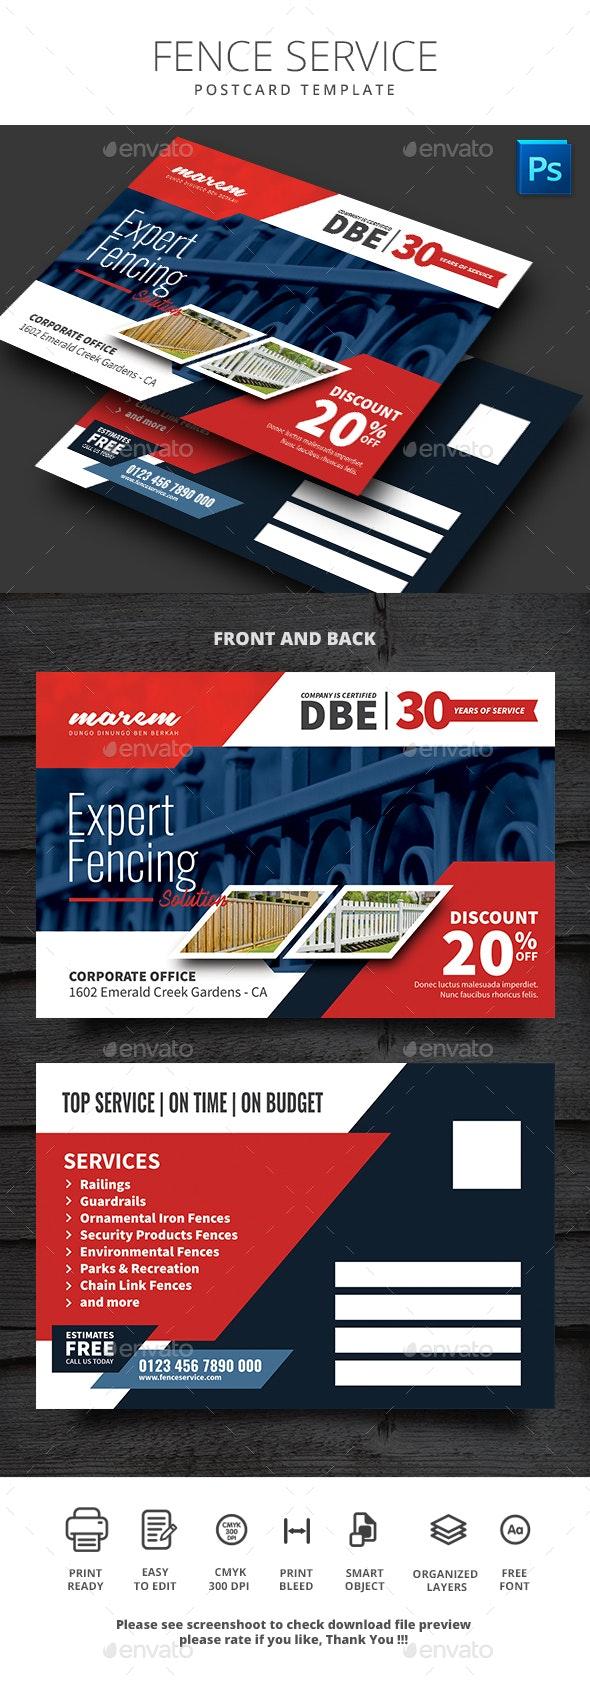 Fence Service Postcard Template - Cards & Invites Print Templates